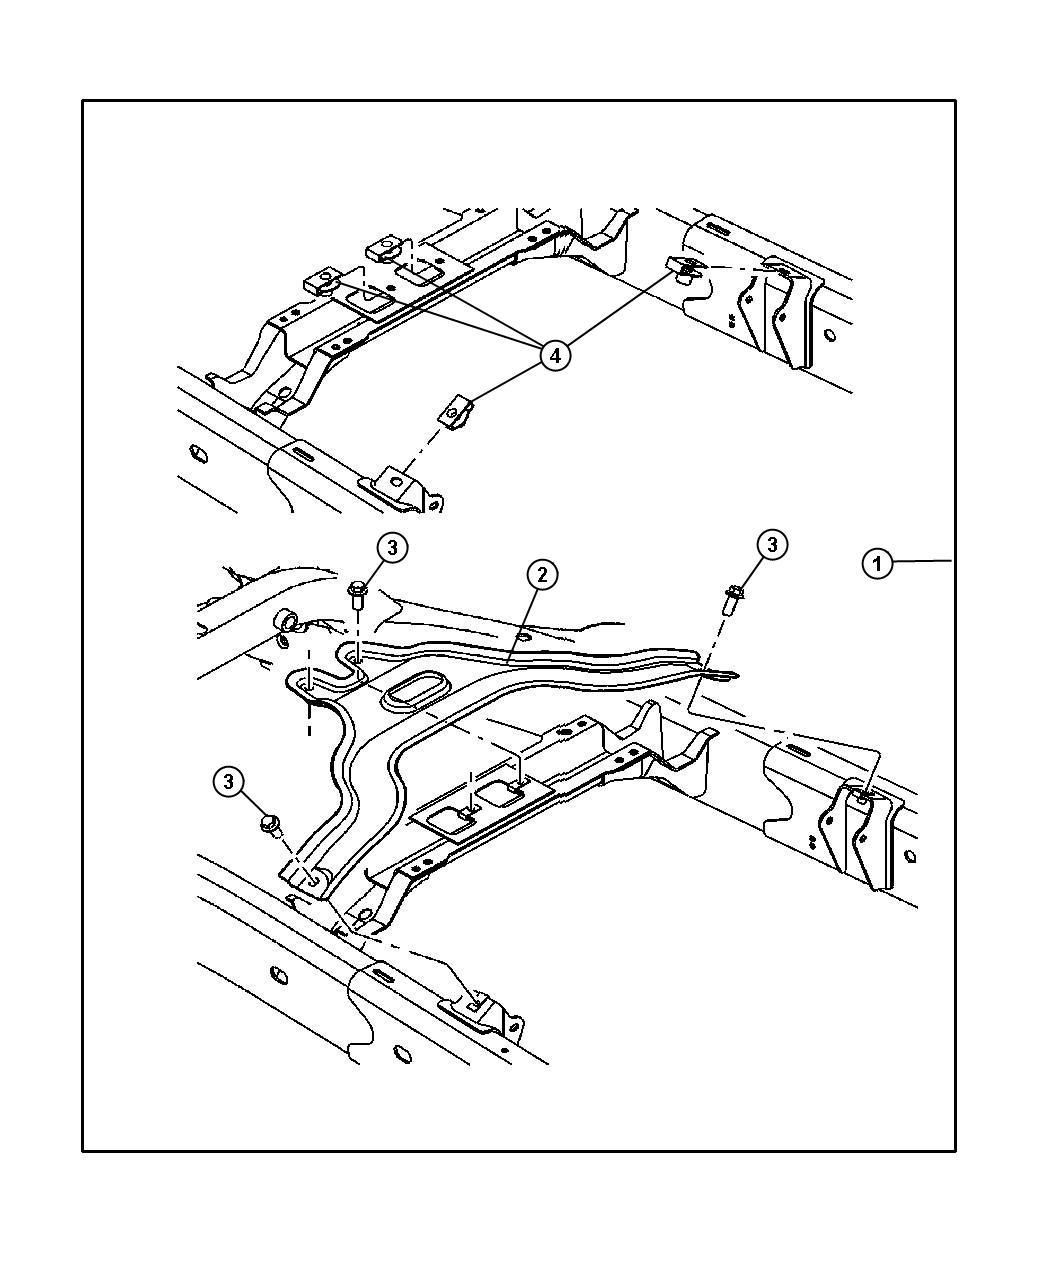 Isuzu Nqr Abs Wiring Diagram